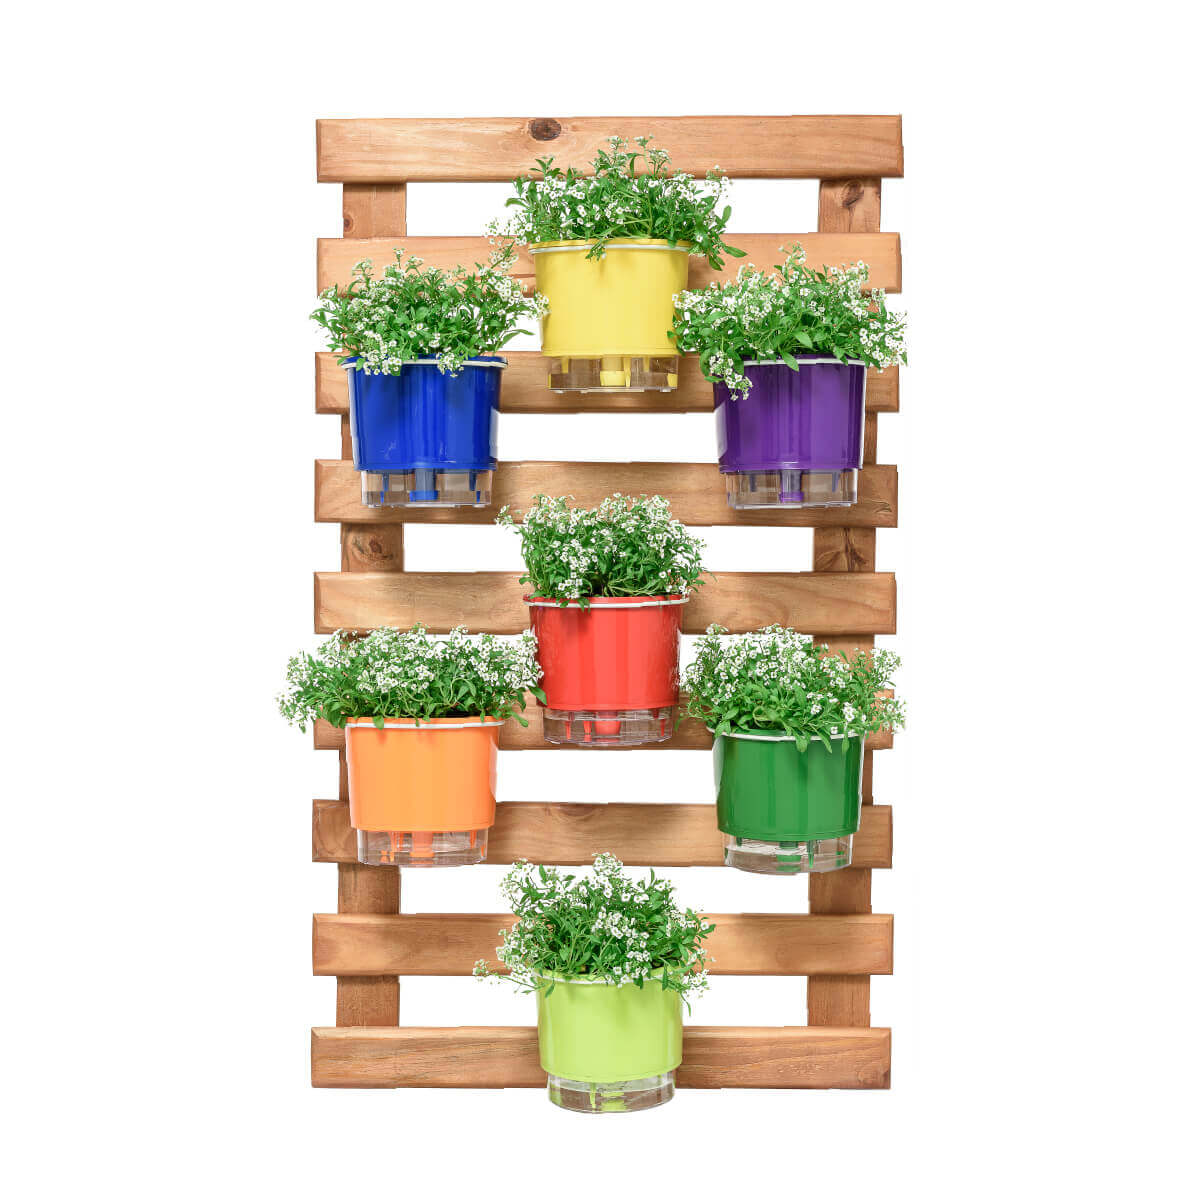 Horta Vertical Caramelo 60cm x 100cm, 7 Vasos Rainbow Médios e Suporte Branco  - Loja Raiz